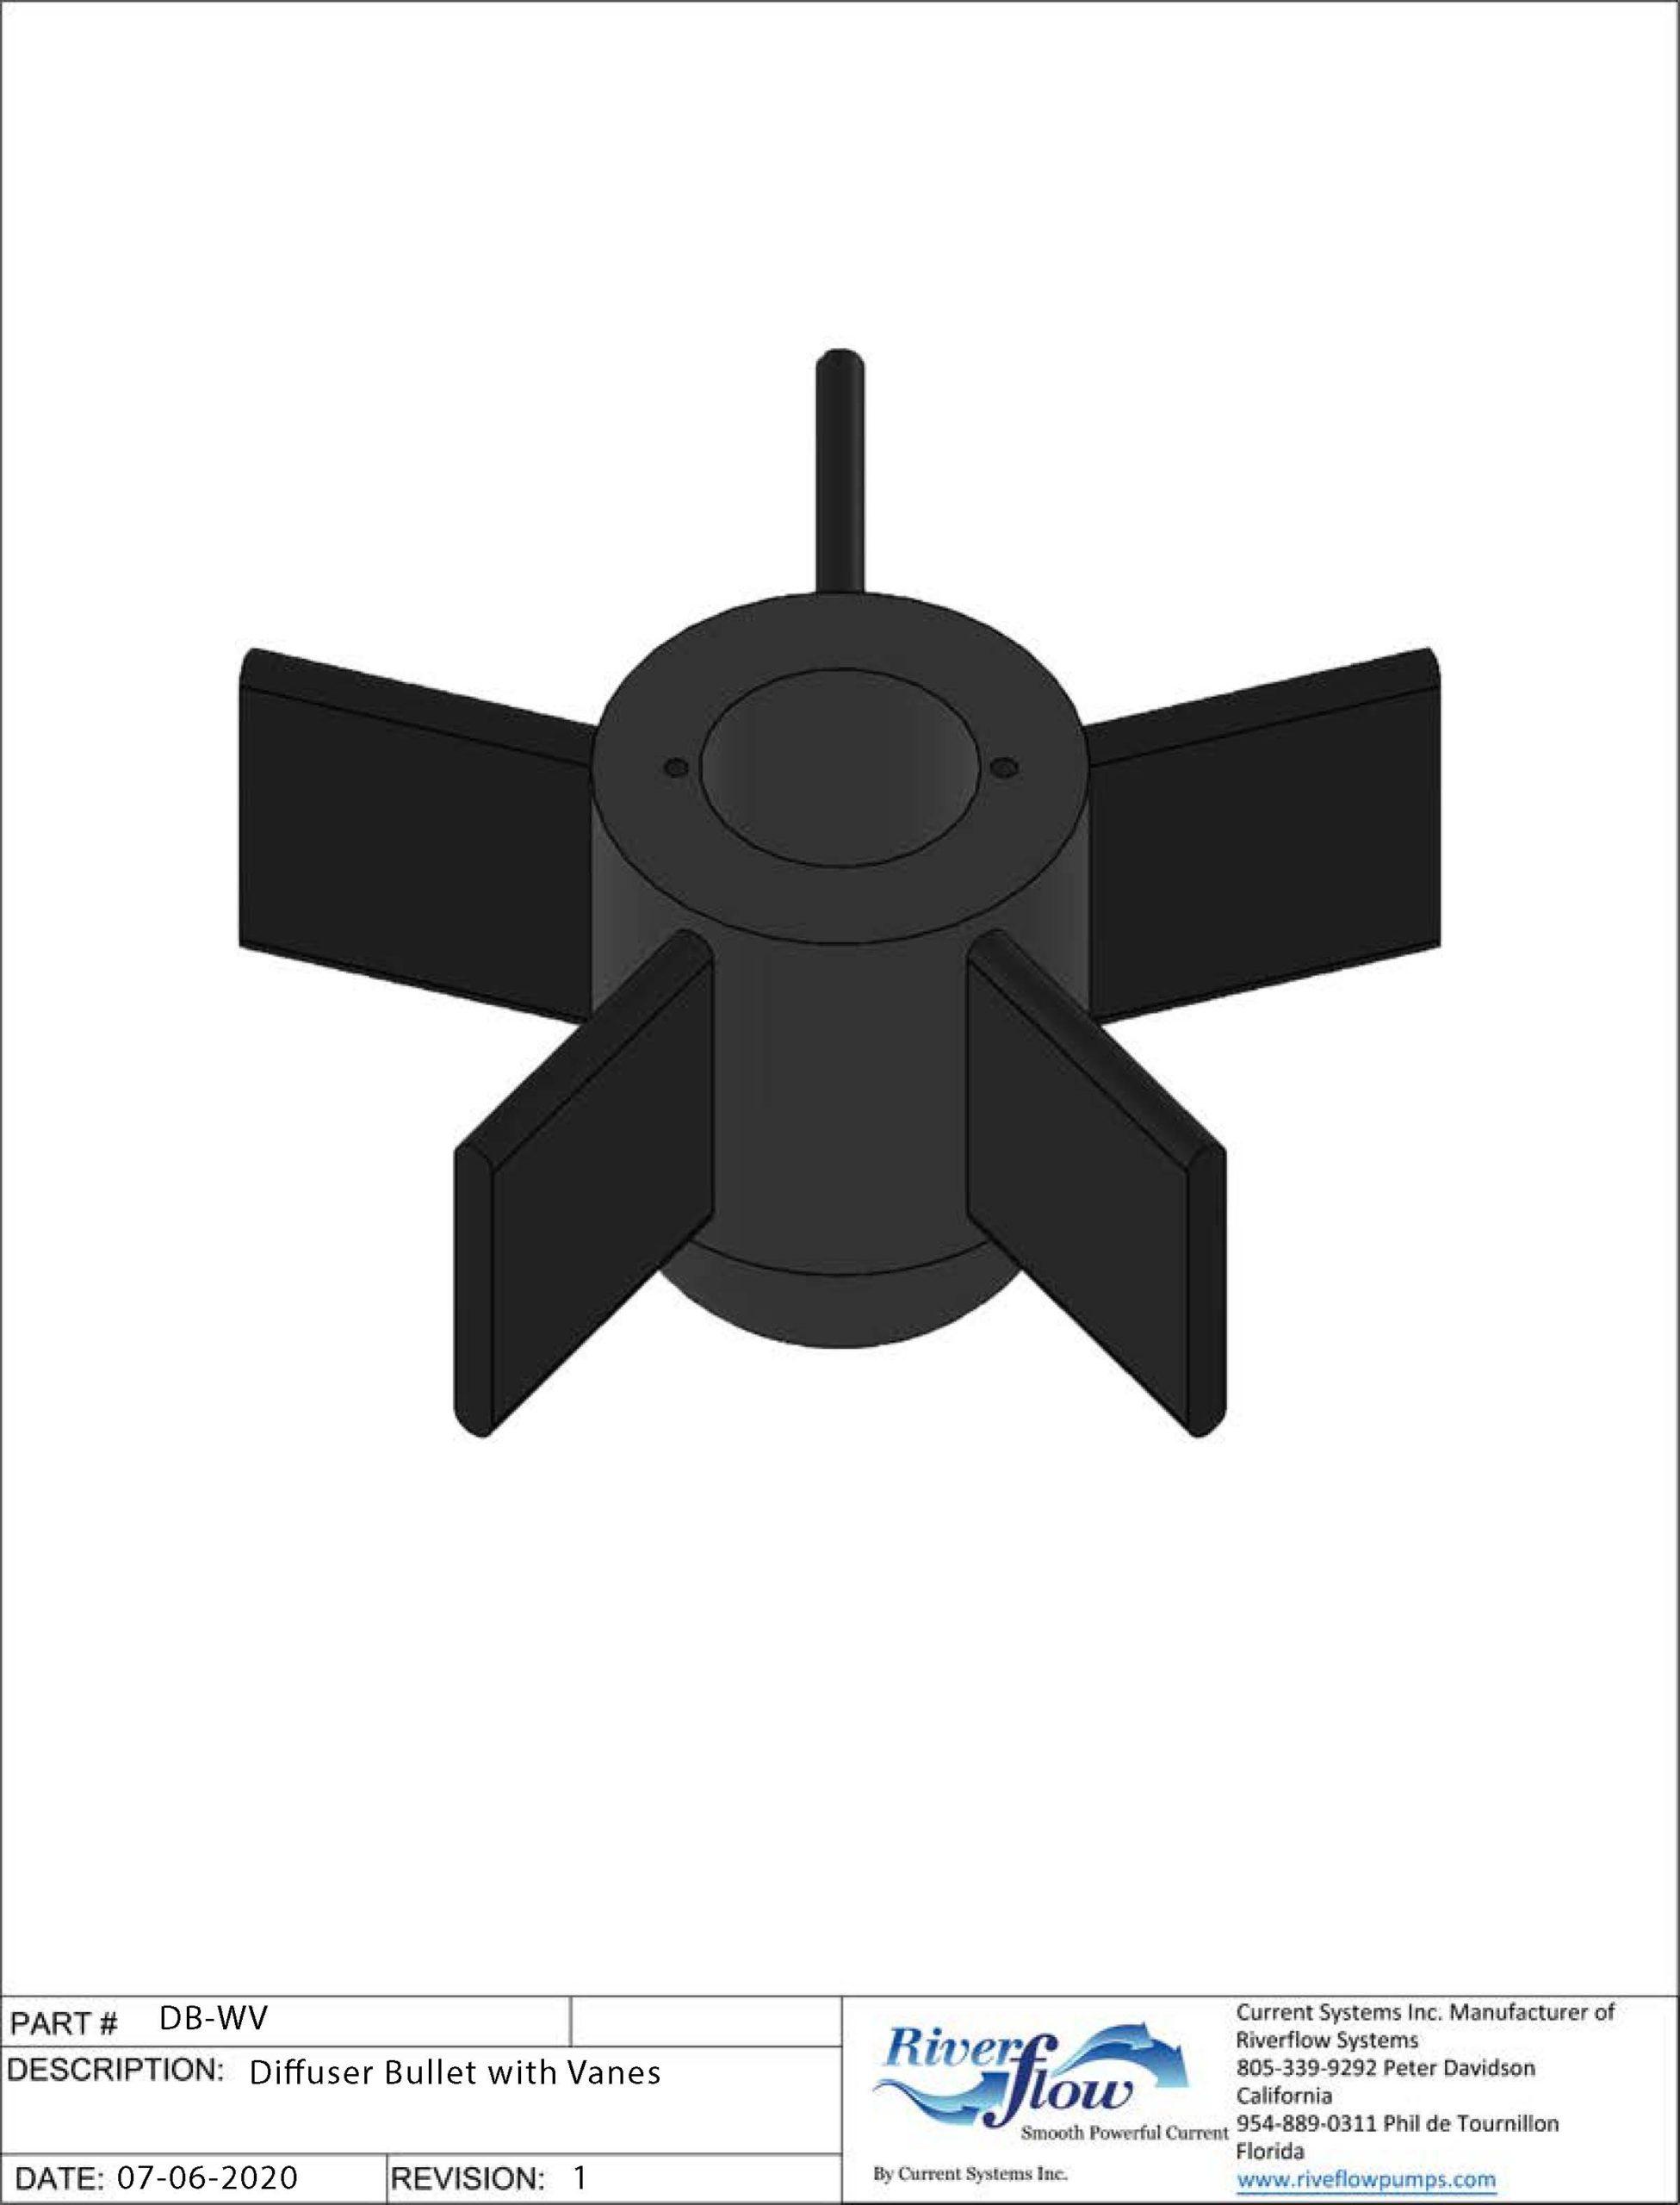 PN#: DB-WV  Diffuser Bullet with Vanes